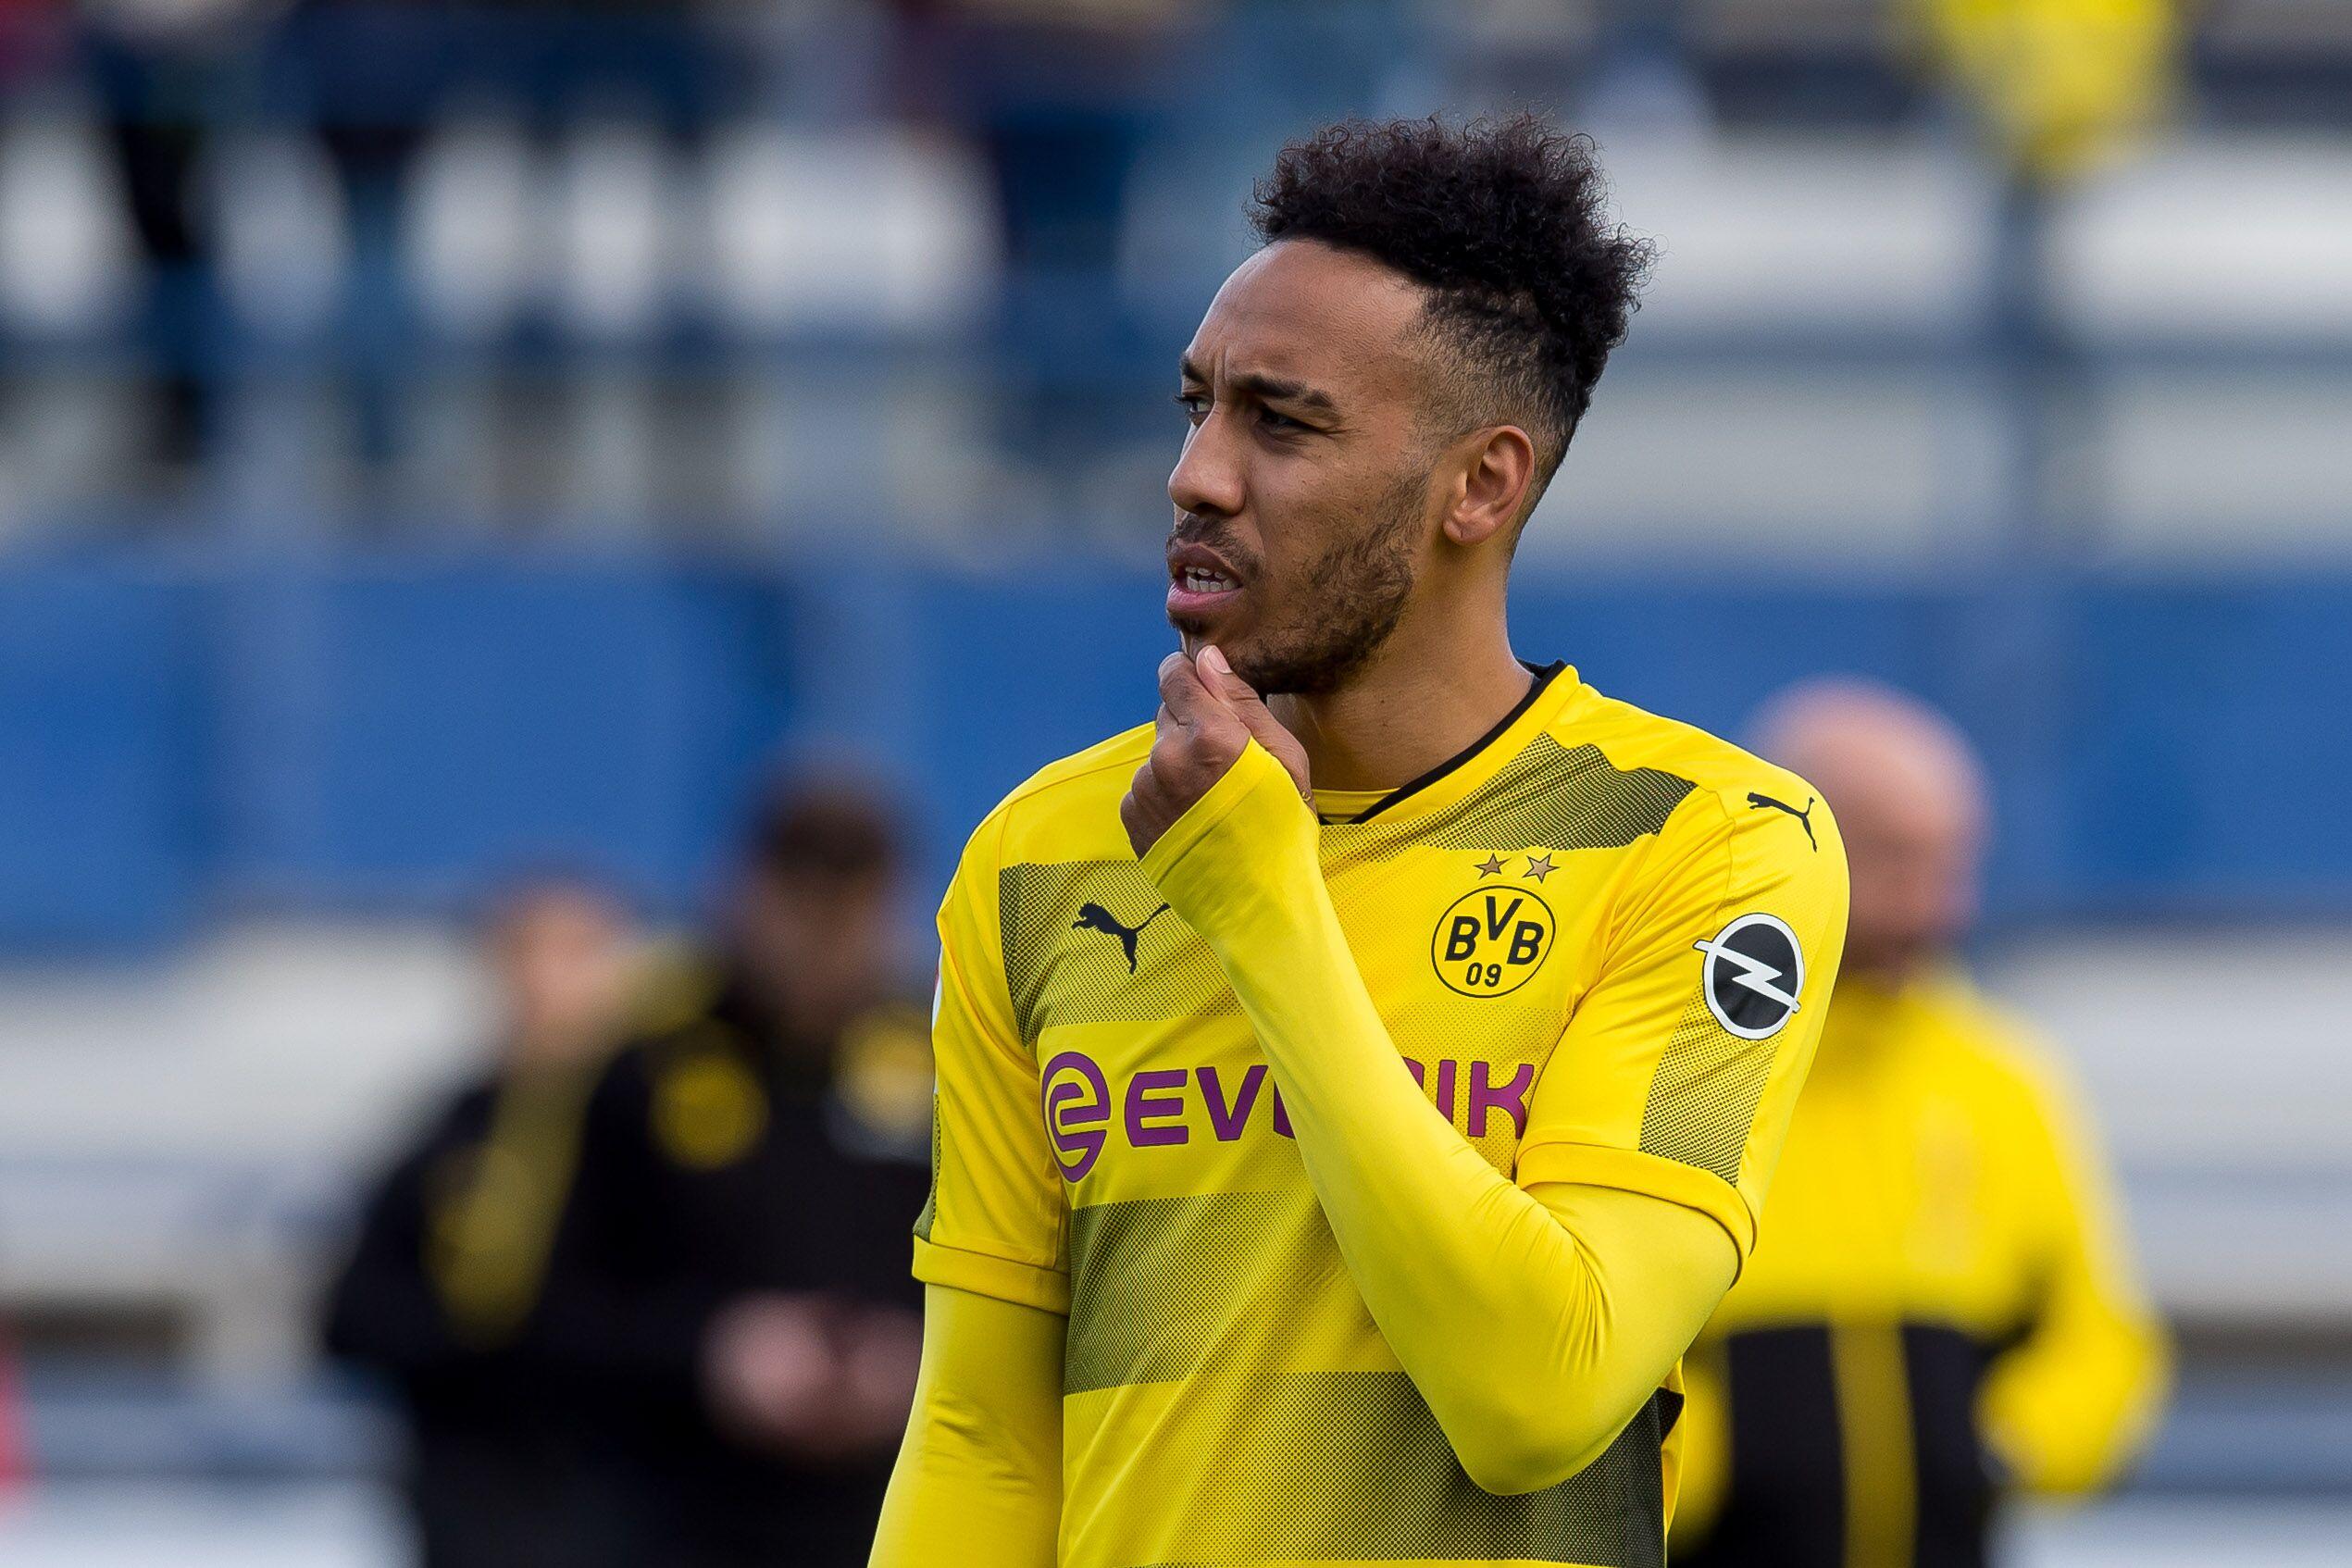 d51cce685 Arsenal make €50 million bid for Borussia Dortmund star Pierre Emerick  Aubameyang